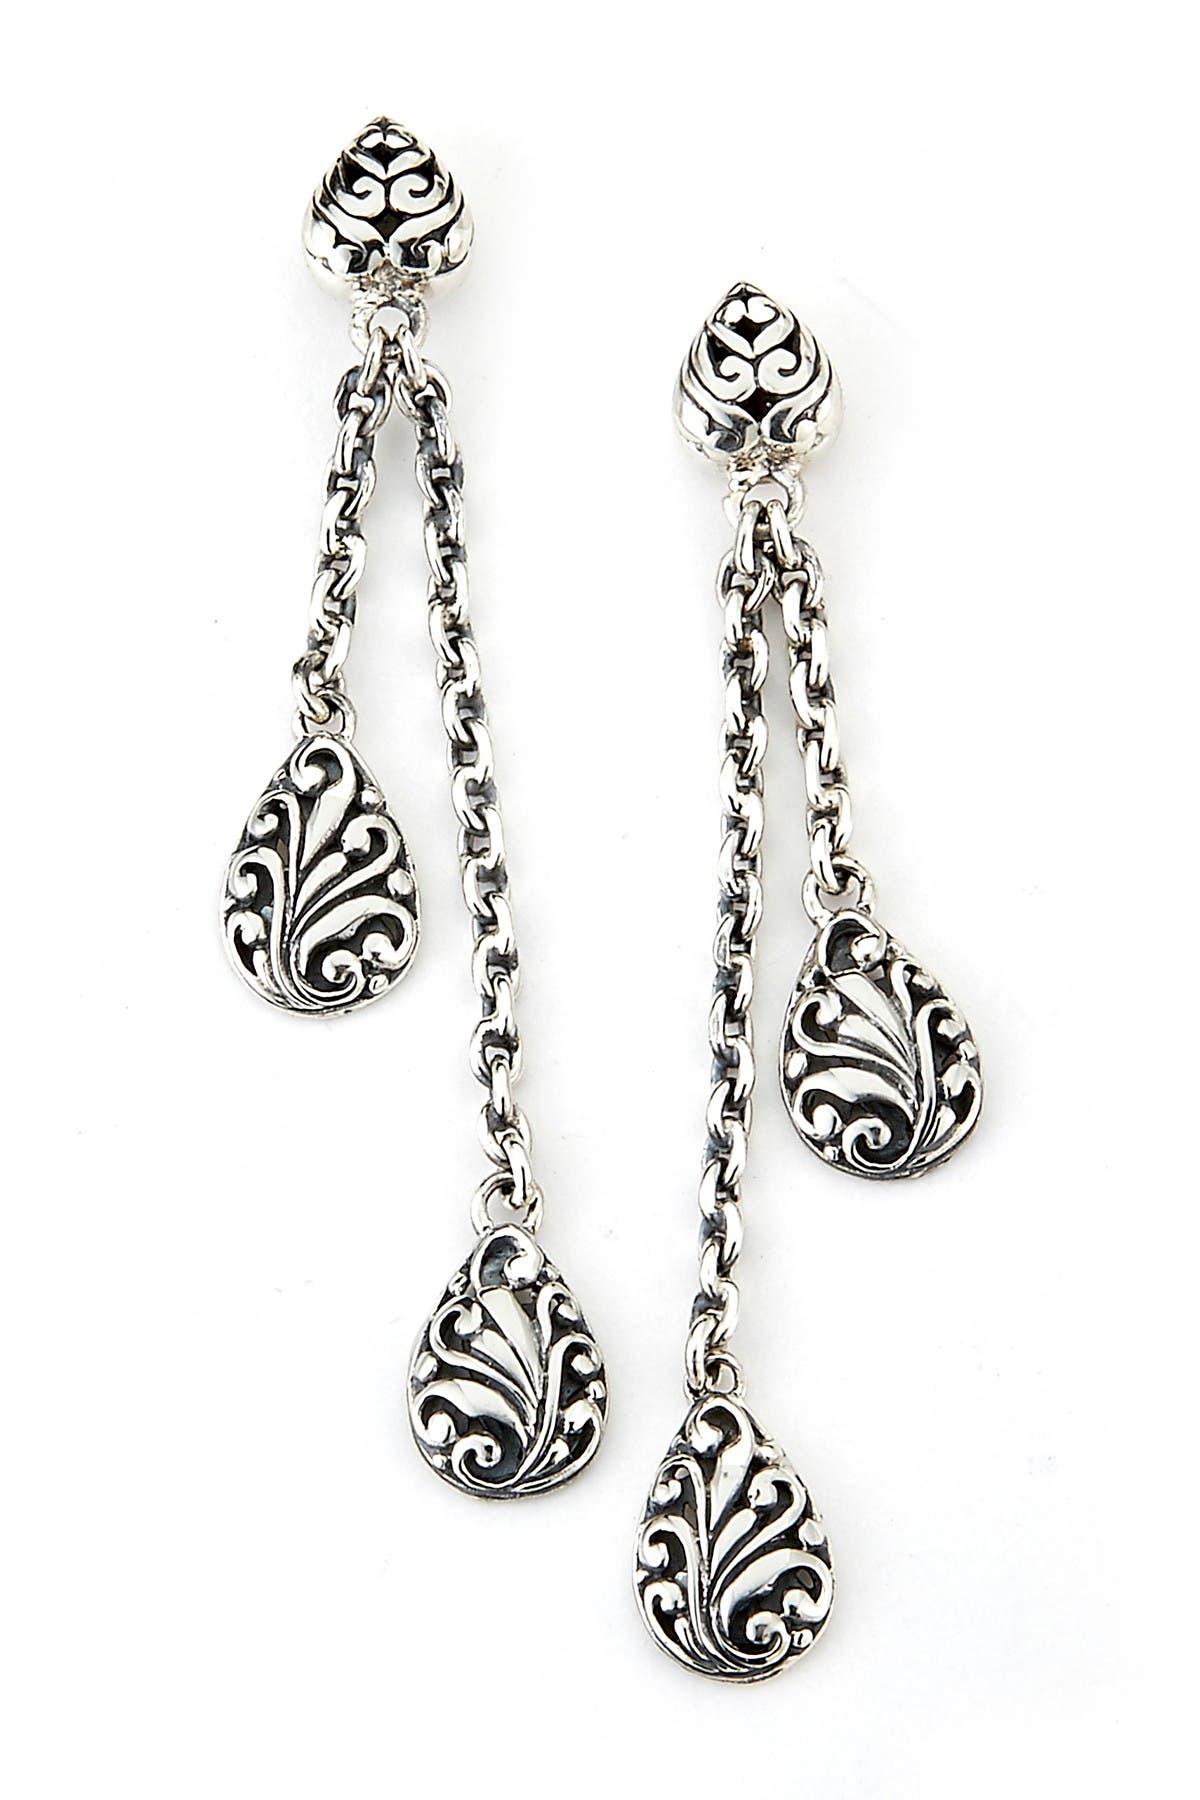 Image of Samuel B Jewelry Sterling Silver Balinese Design Dangling Earrings